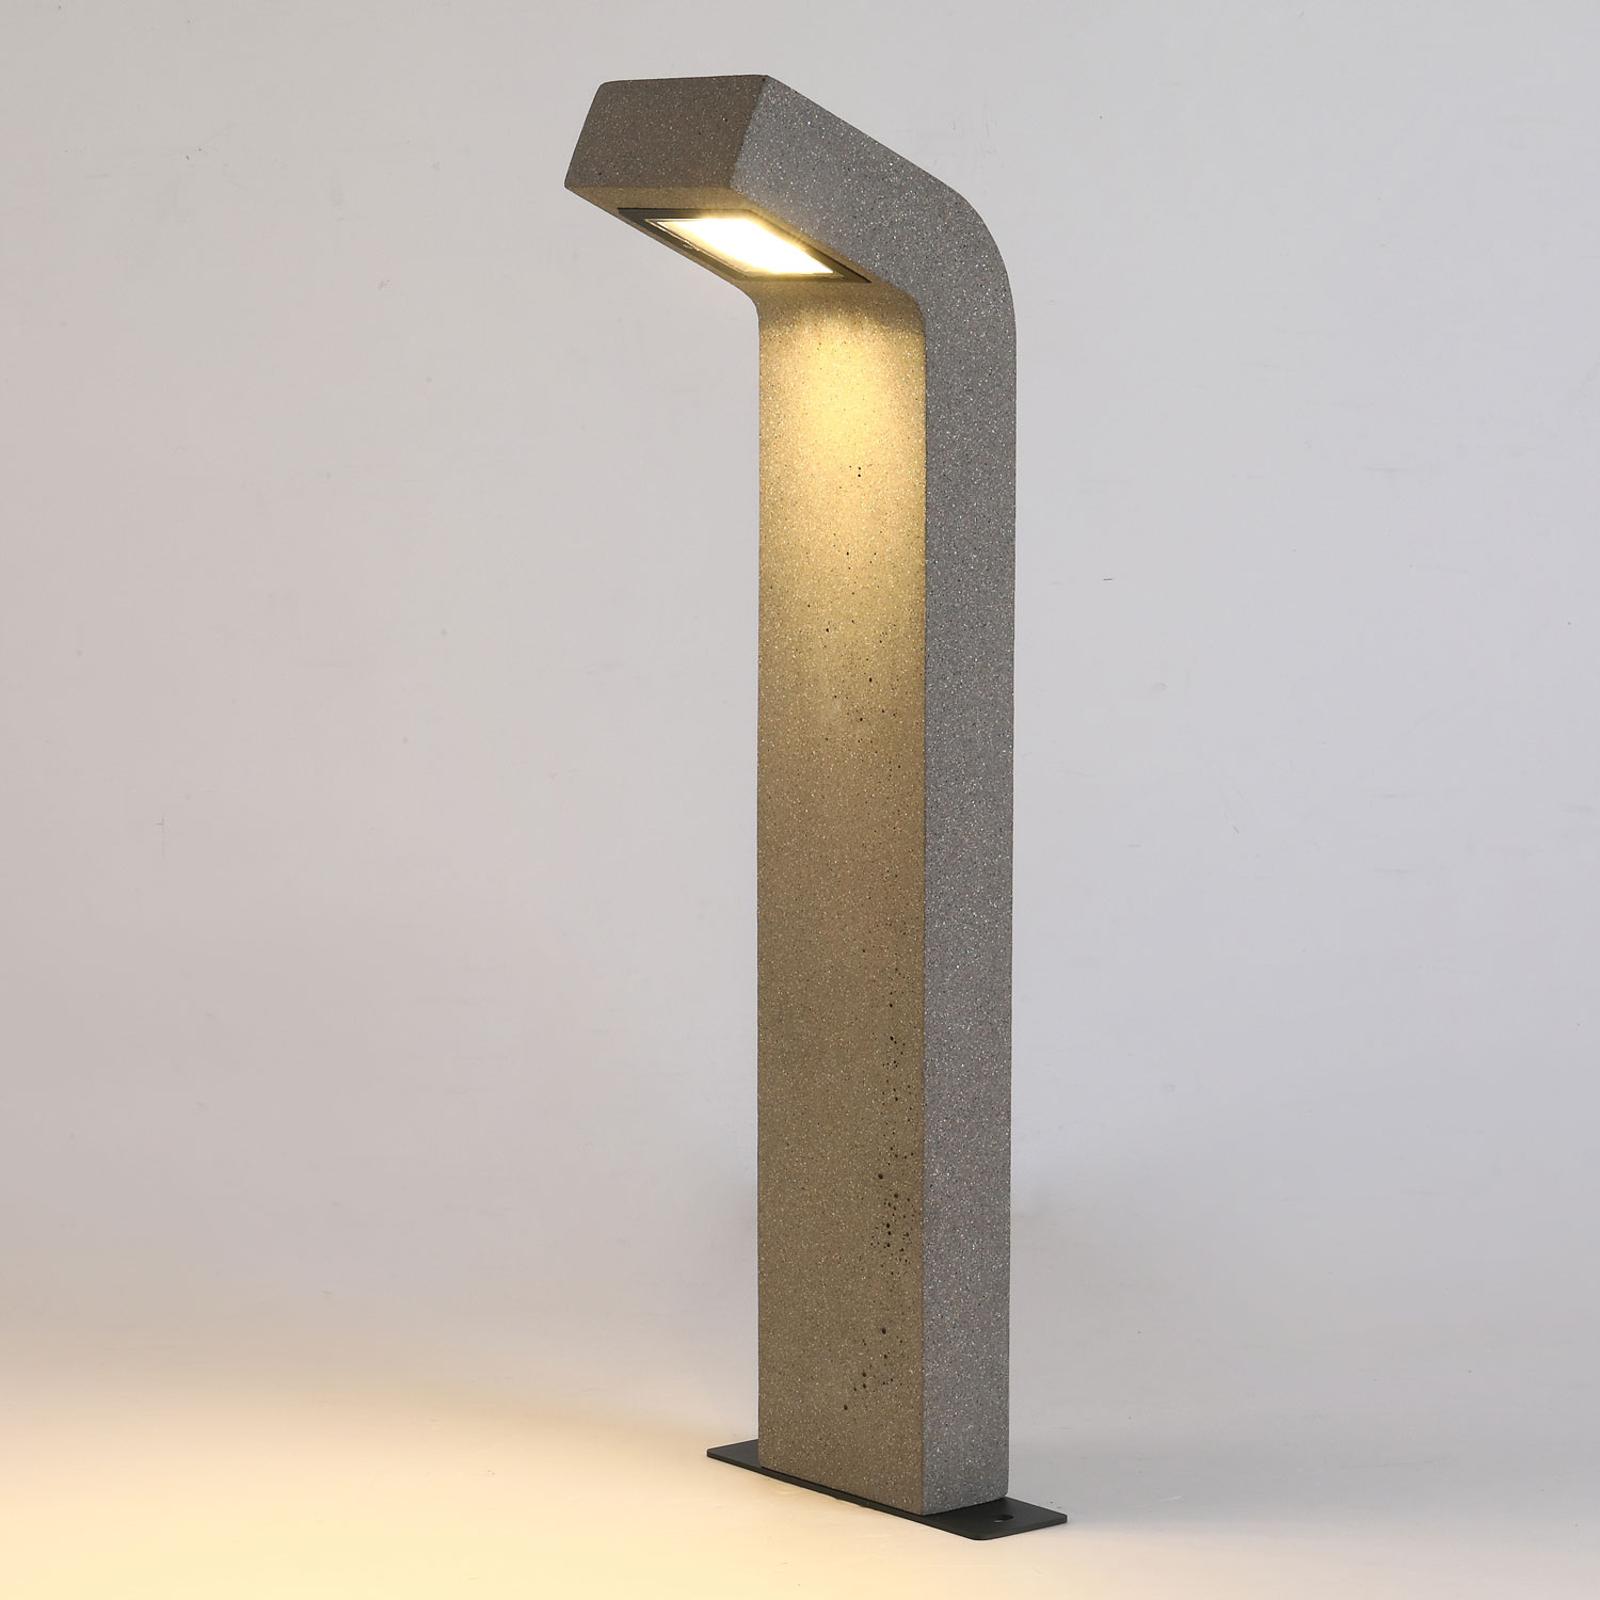 Arcchio-LED-pylväsvalaisin Vavara, korkeus 70 cm